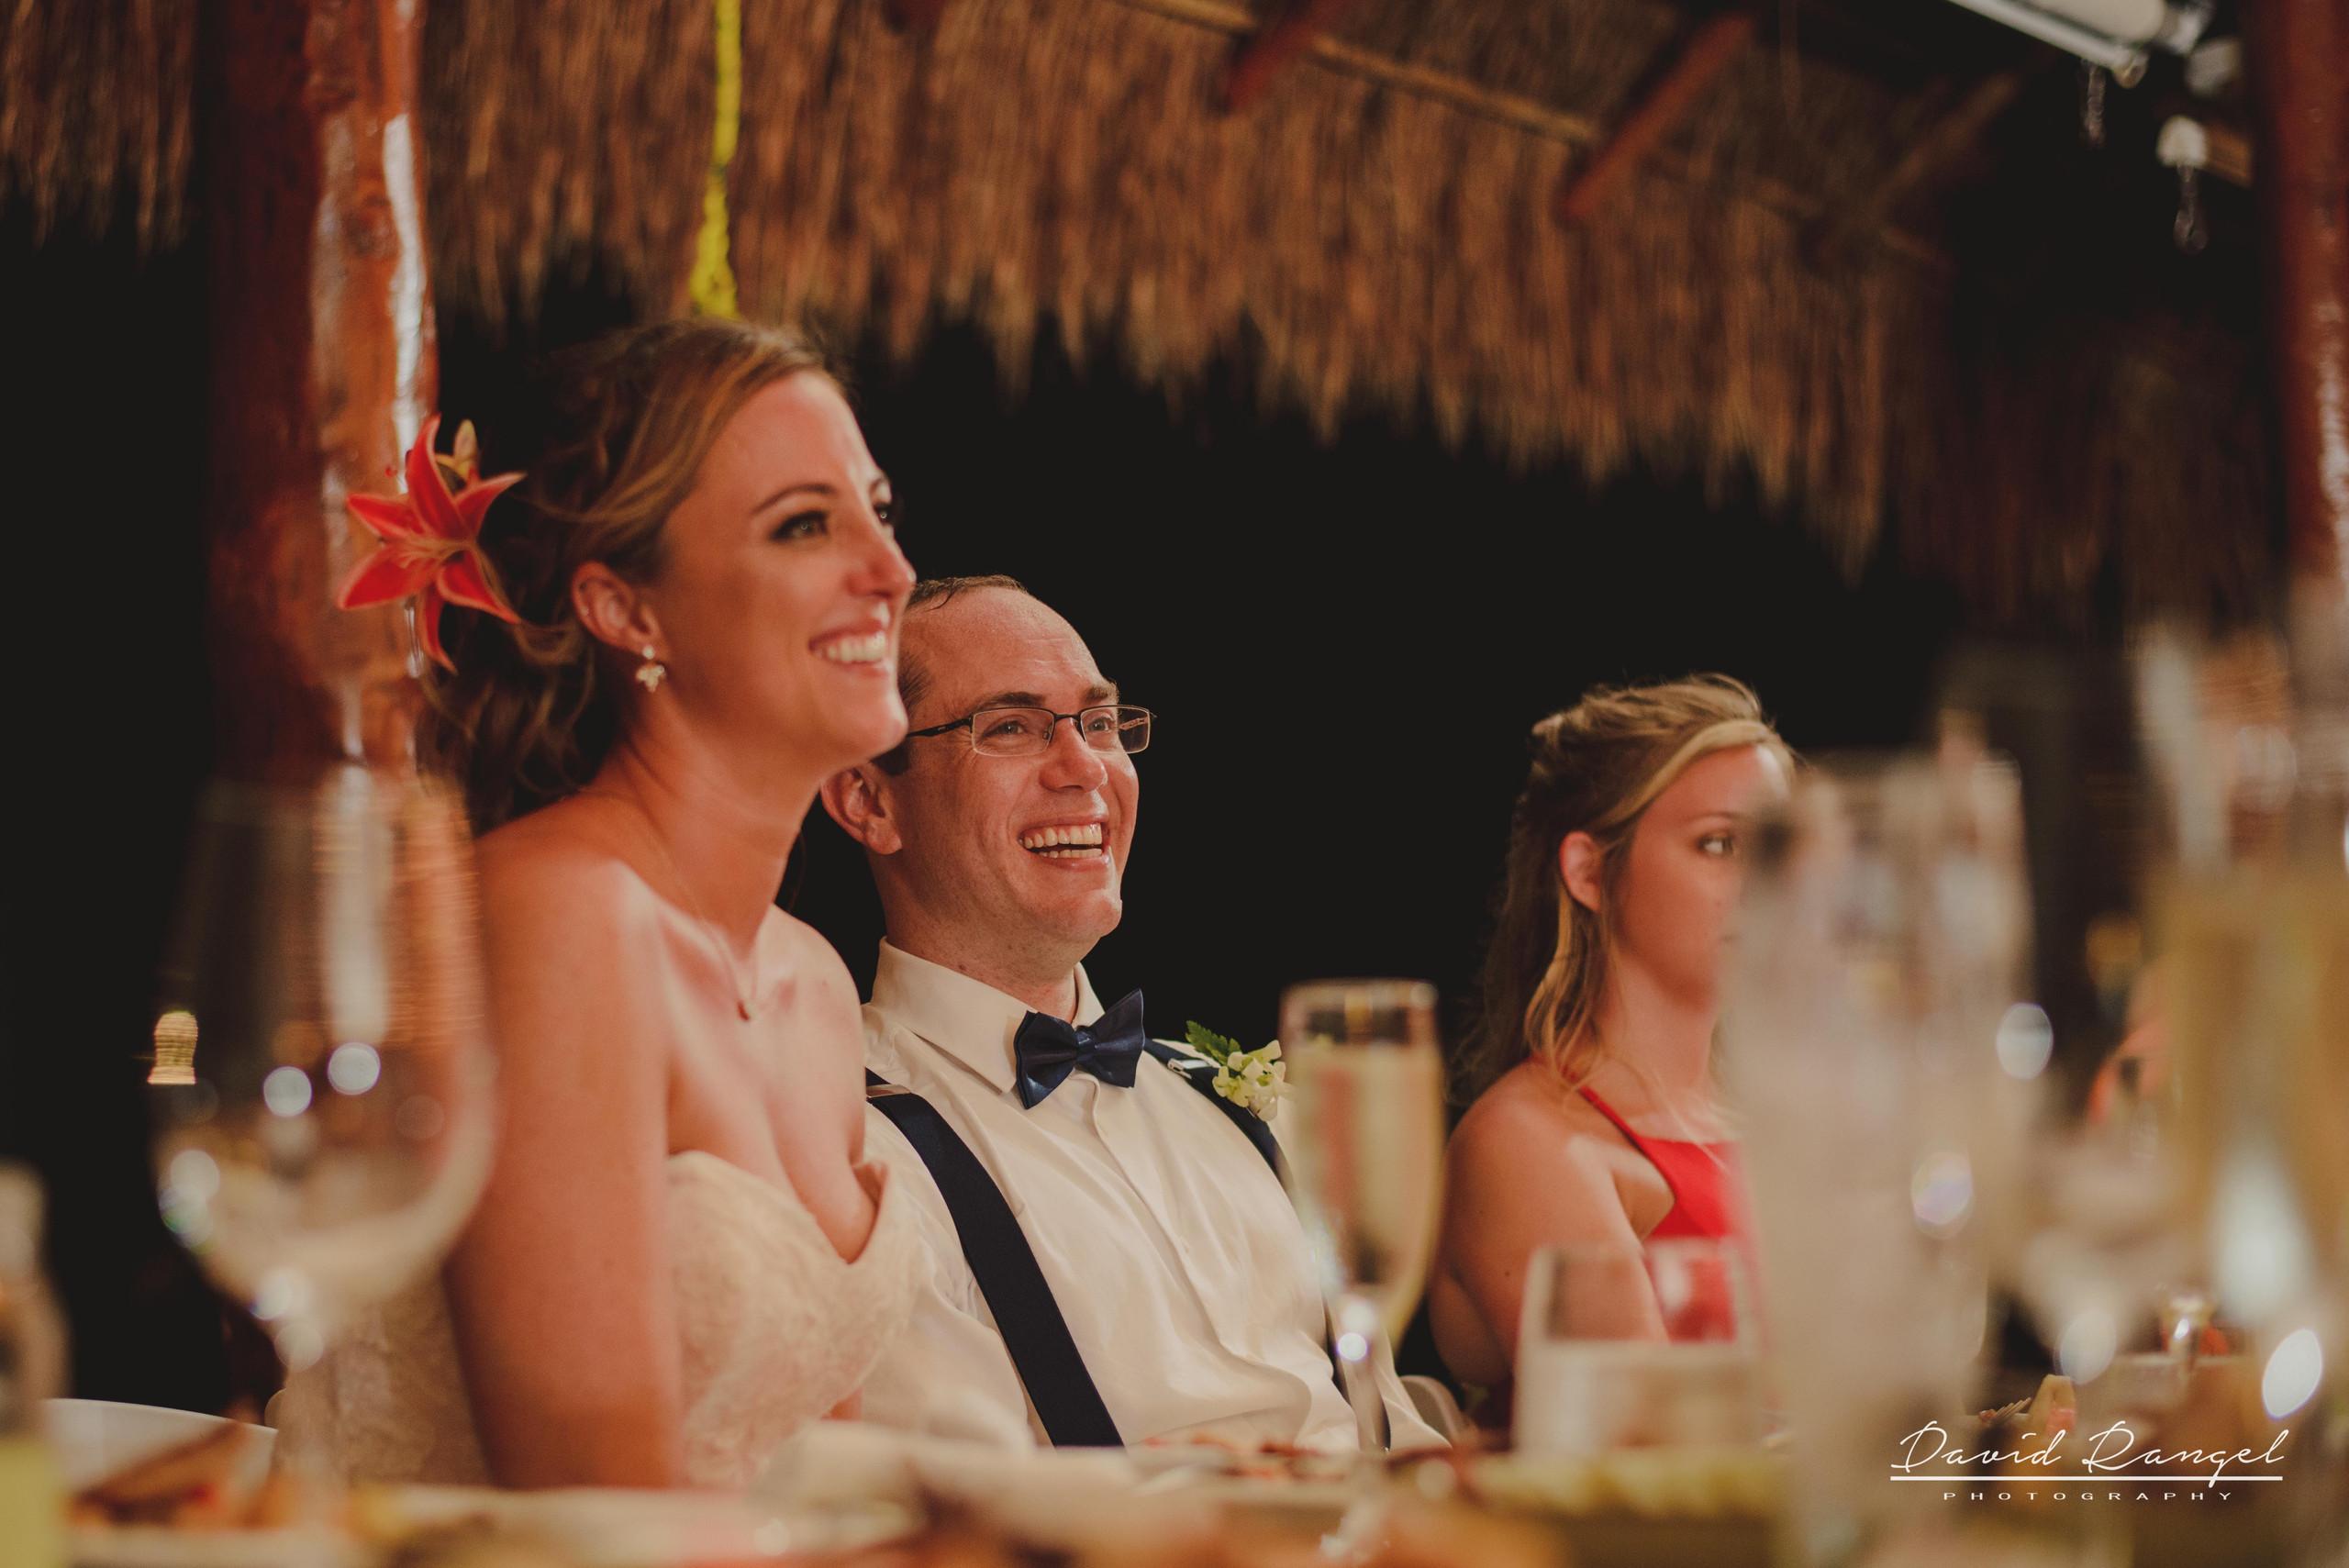 wedding+speaches+bride+groom+father+floor